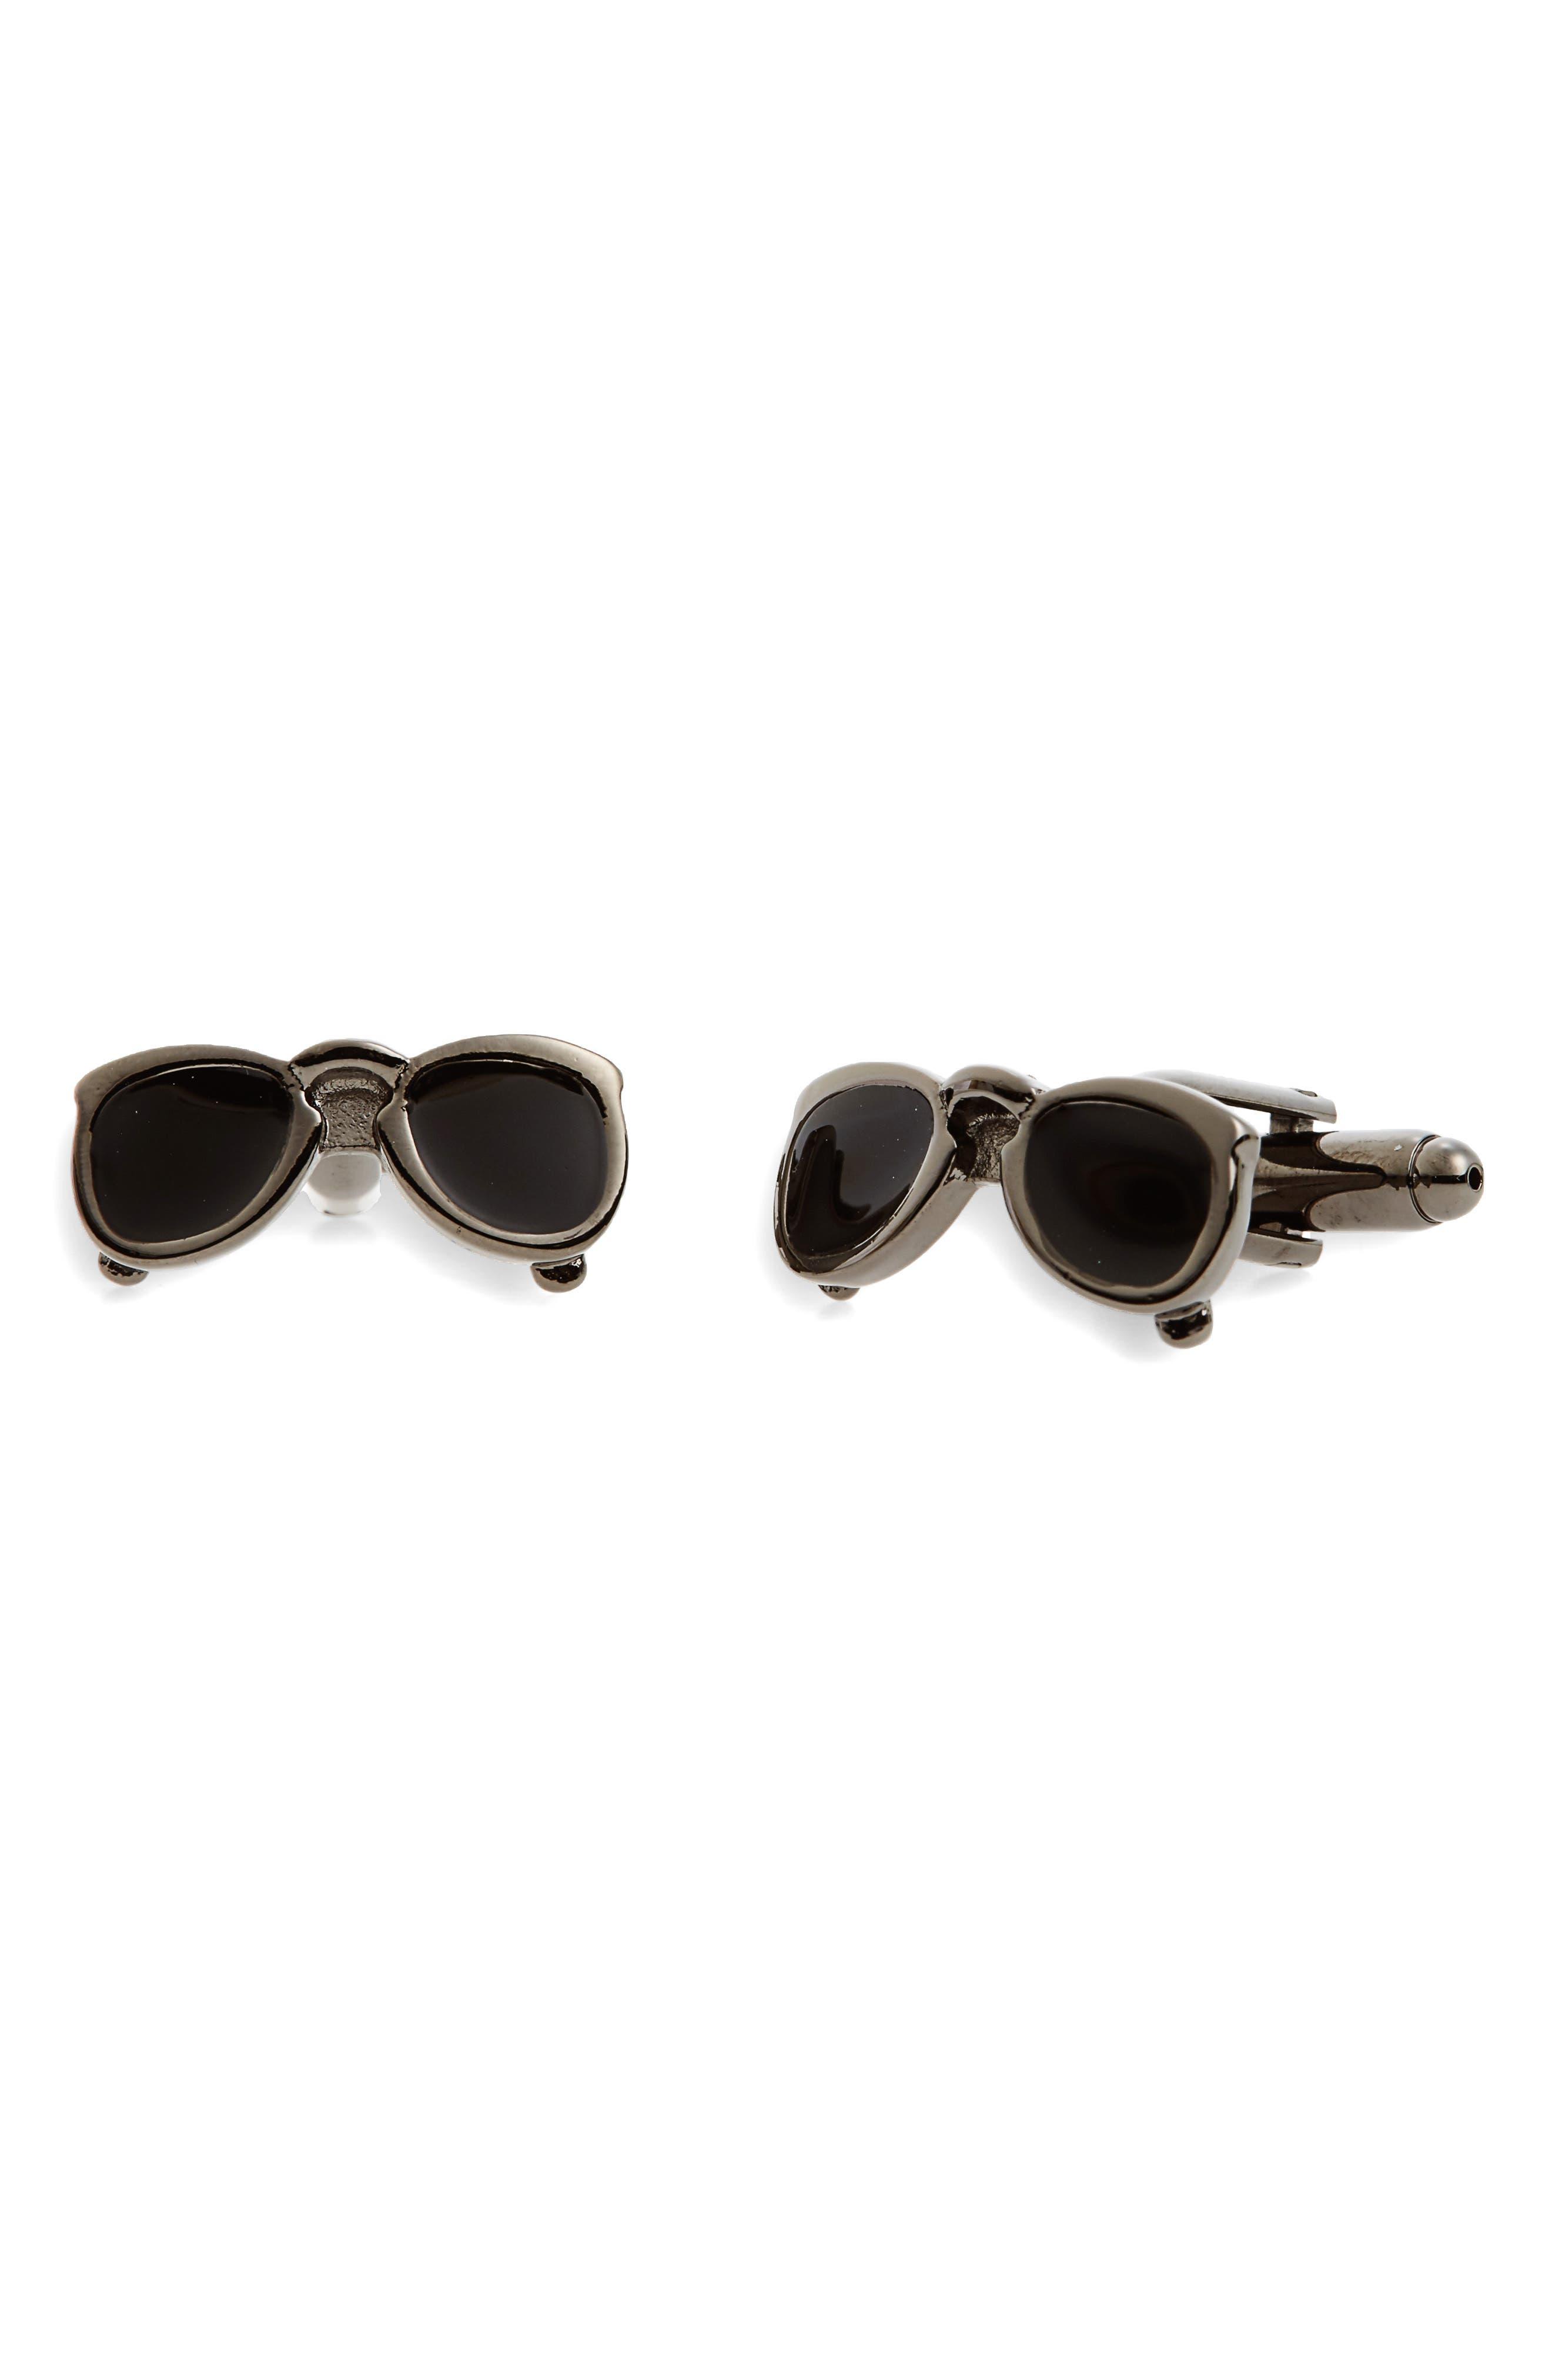 Sunglasses Cuff Links,                             Main thumbnail 1, color,                             Black